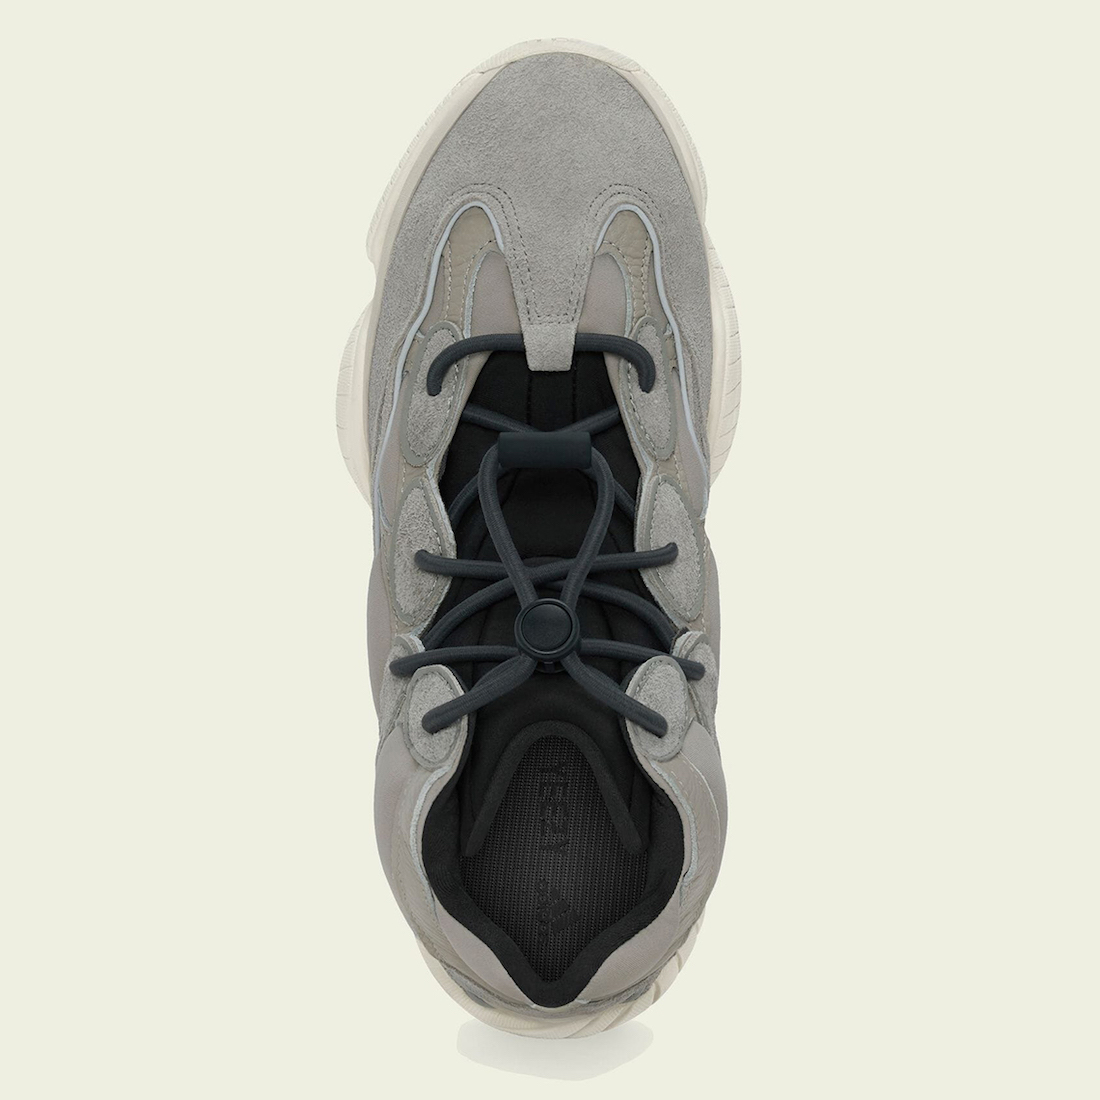 adidas-Yeezy-500-High-Mist-Stone-GV7775-Release-Date-2